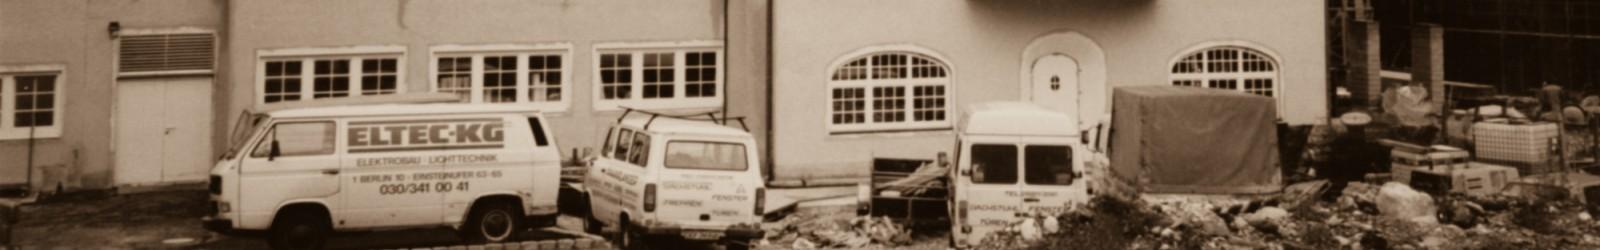 Chronik Bayerischer Hof Miesbach